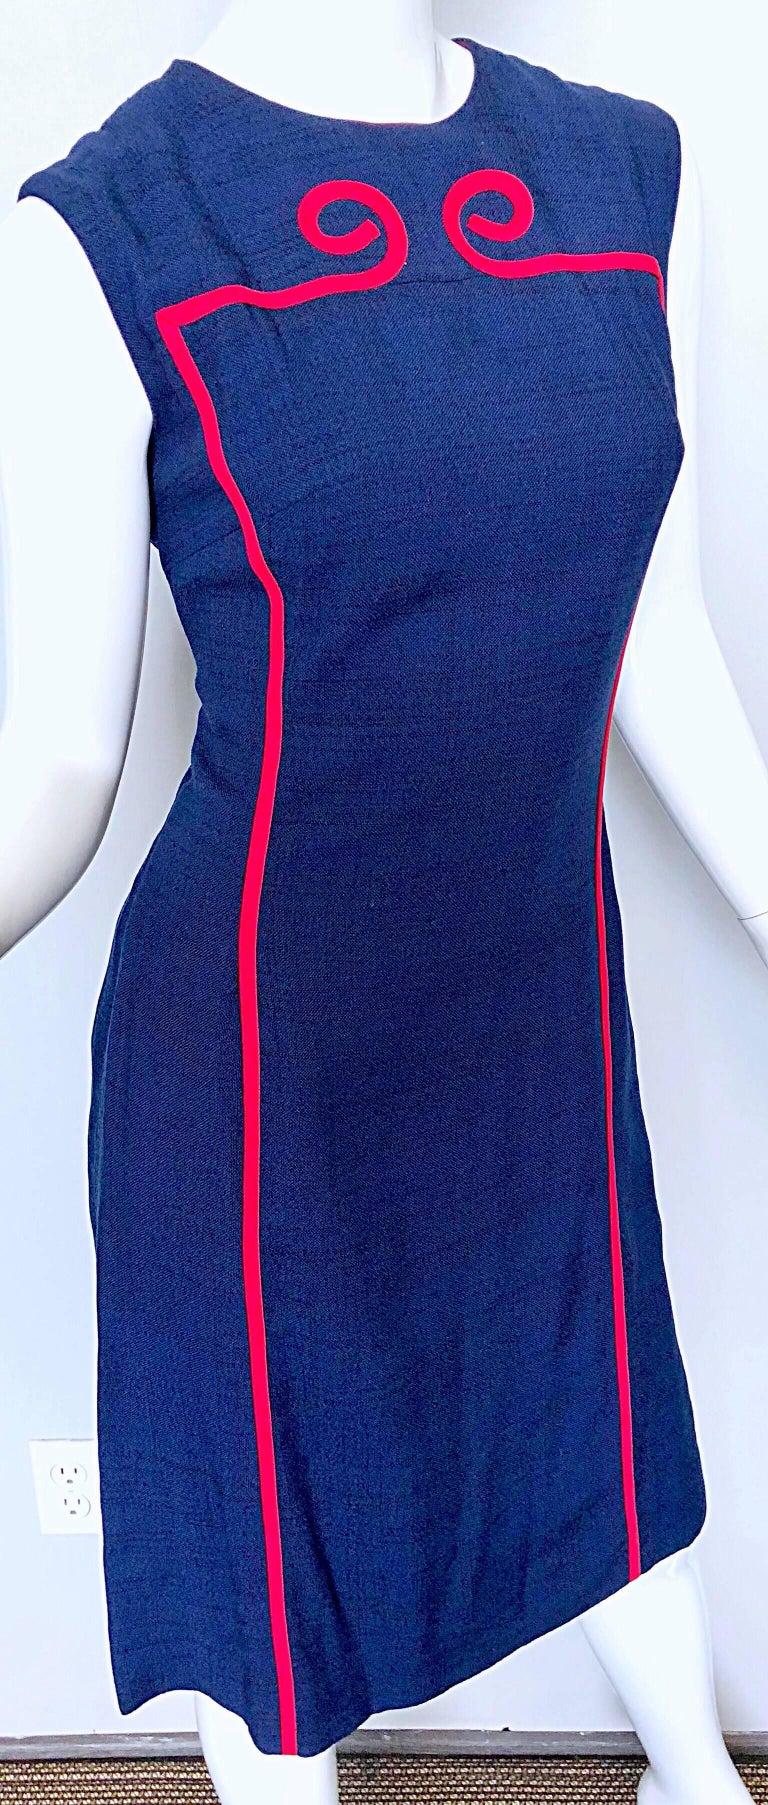 Joseph Magnin 1960s Navy Blue + Red Linen Silk Nautical Vintage 60s Shift Dress For Sale 1